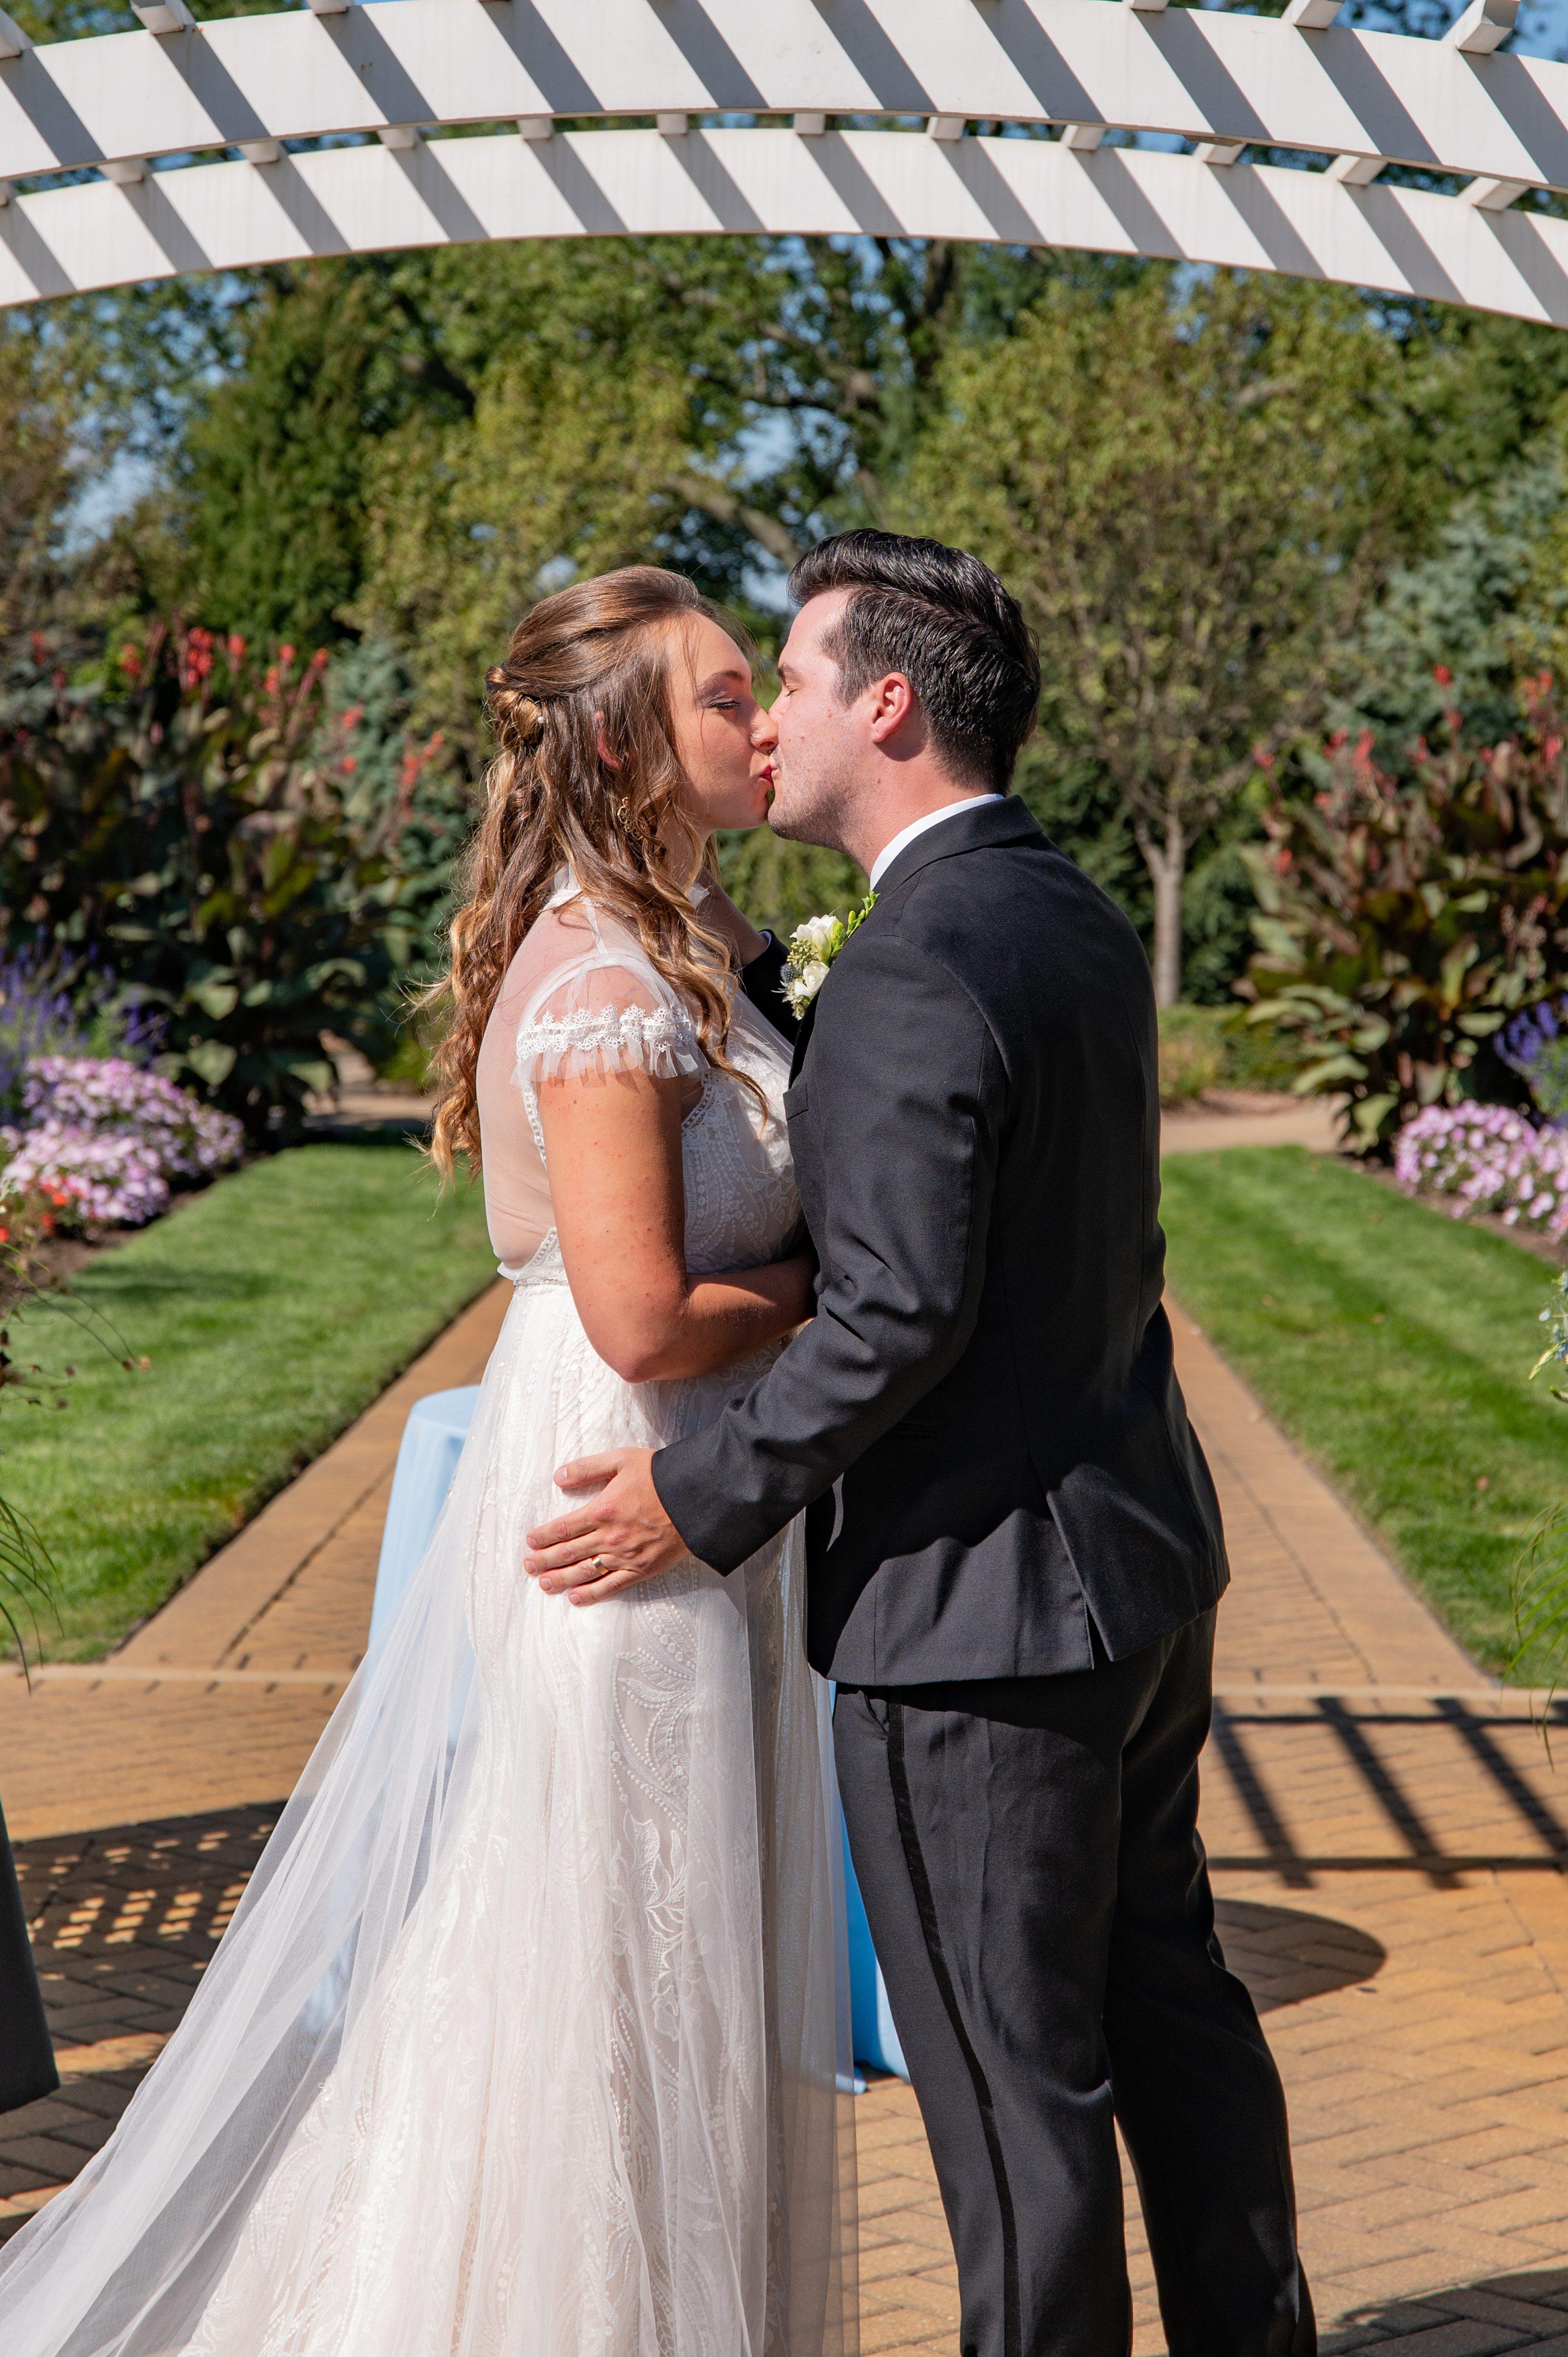 Wheaton wedding photographer, Oak Brook photographers